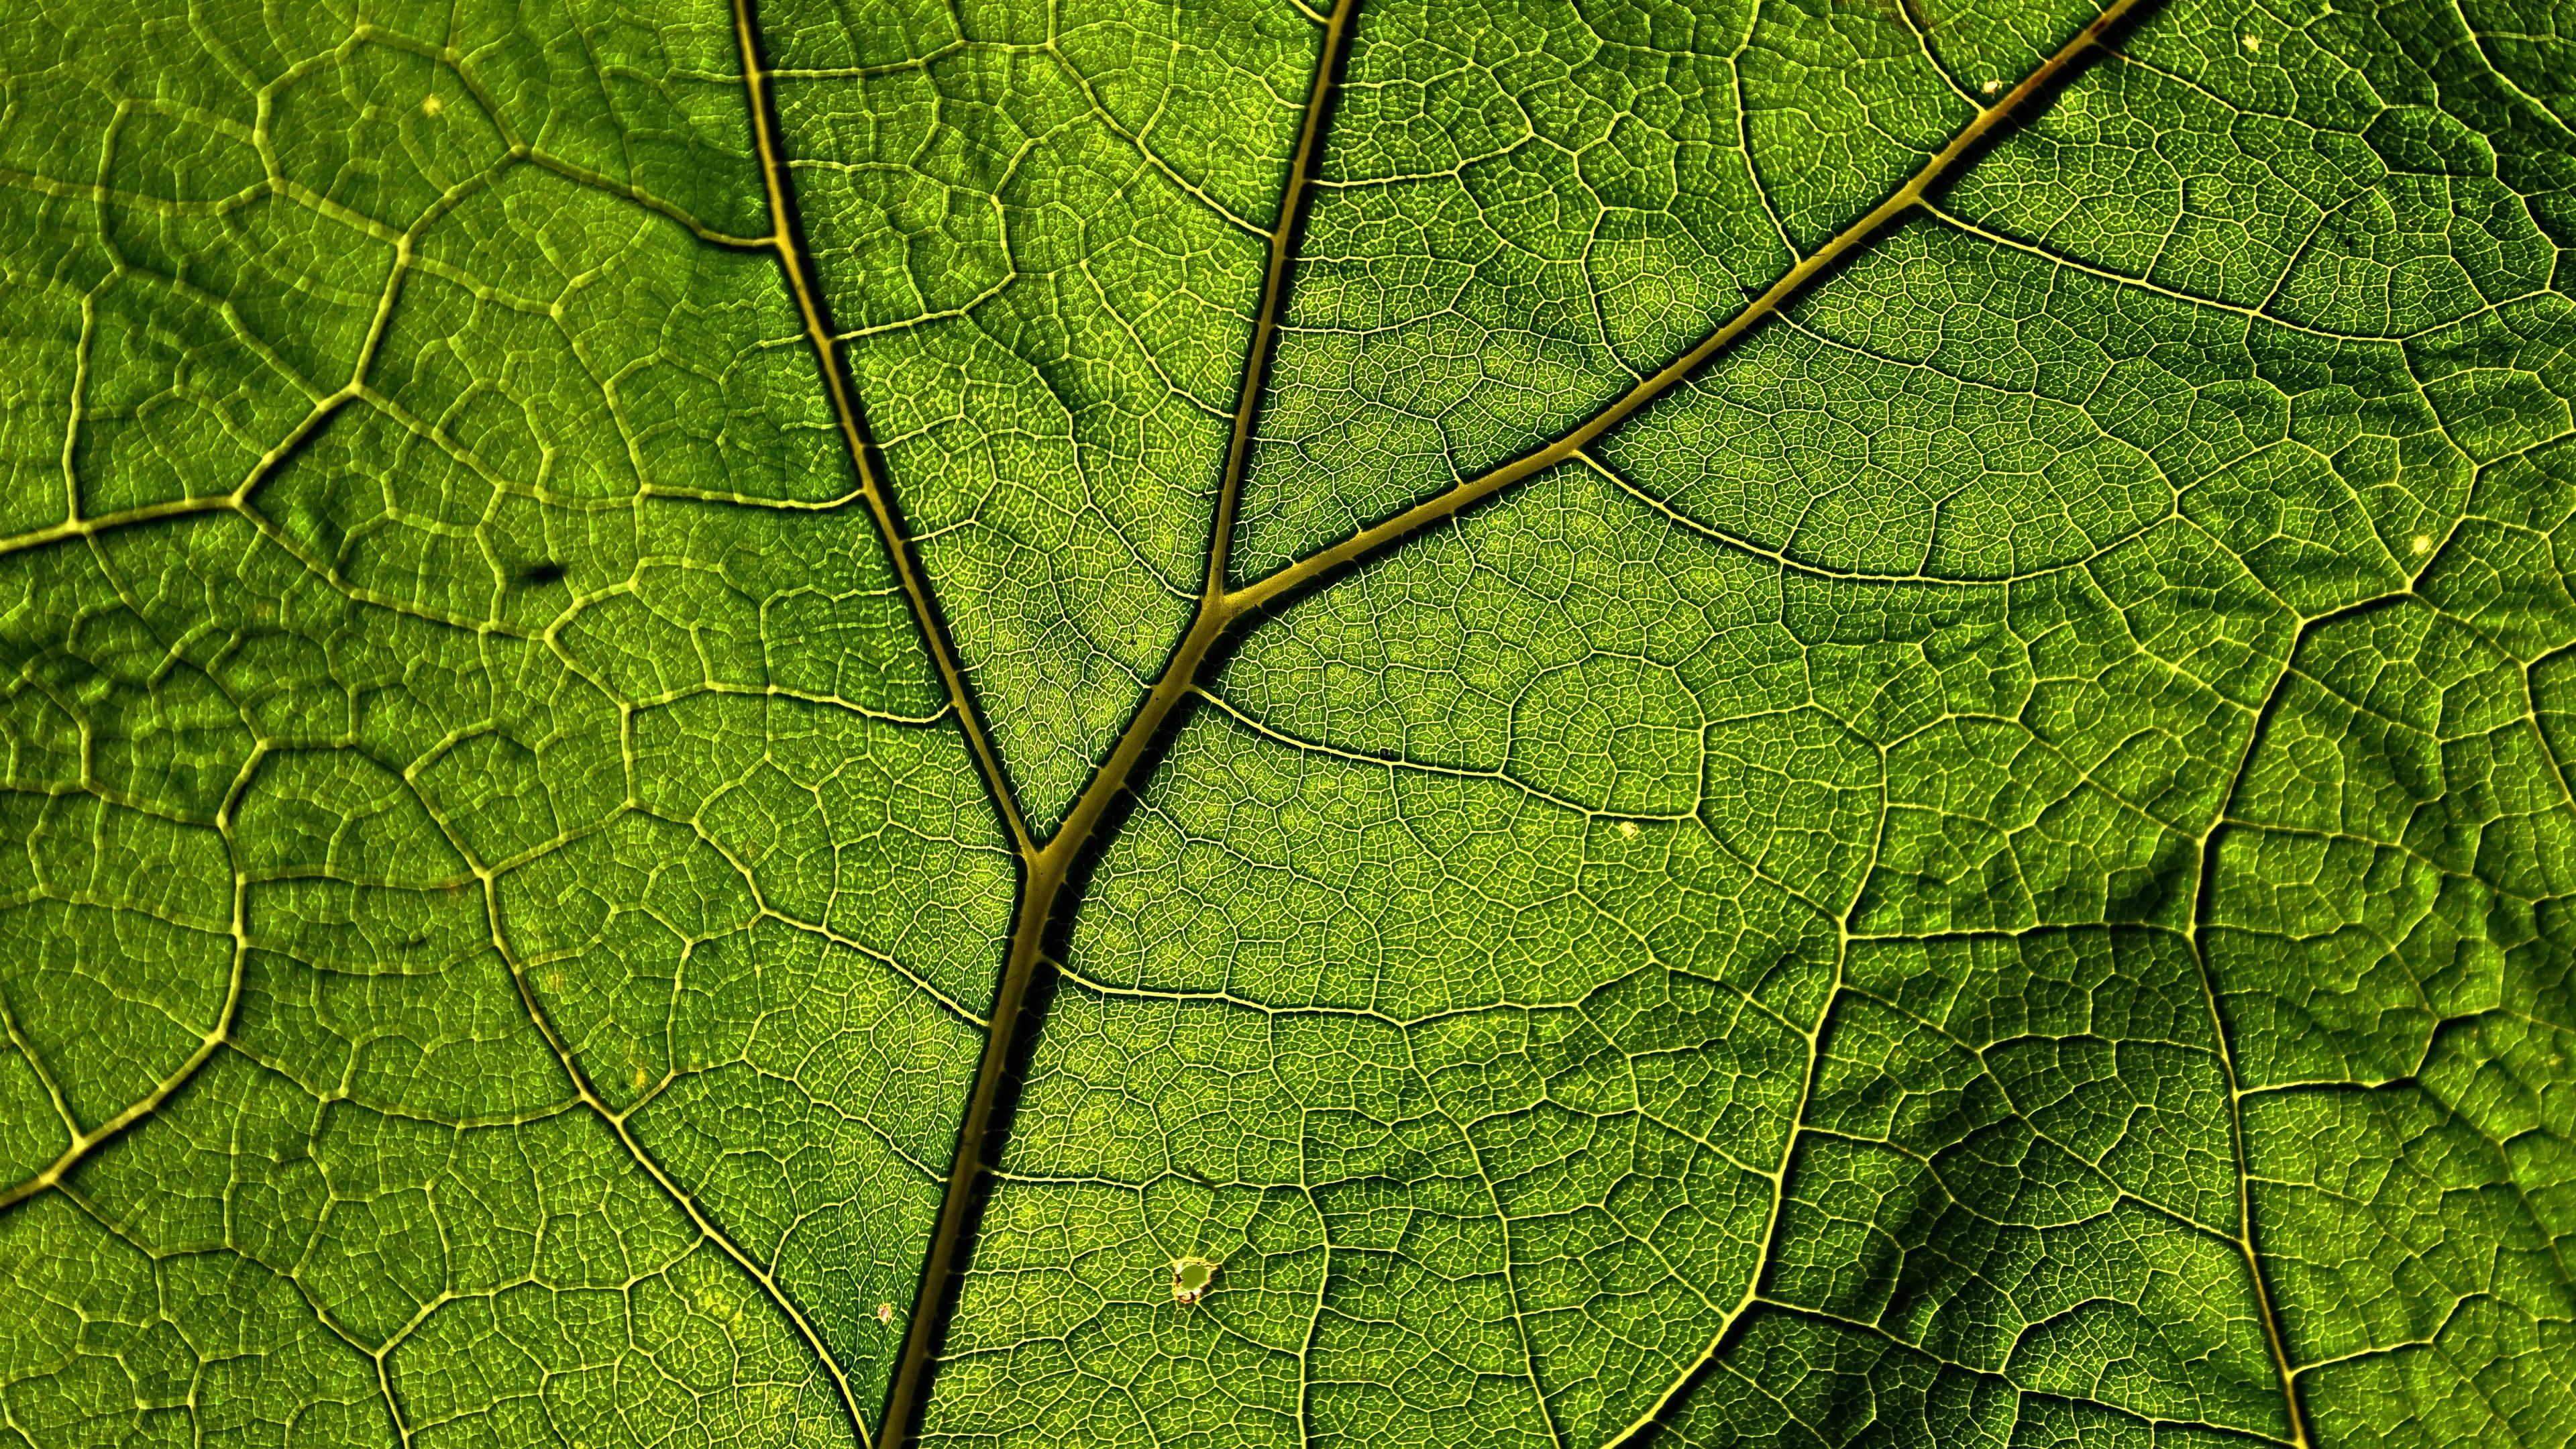 Plant Veins Leaf Macro Uhd 4k Wallpaper Pixelz